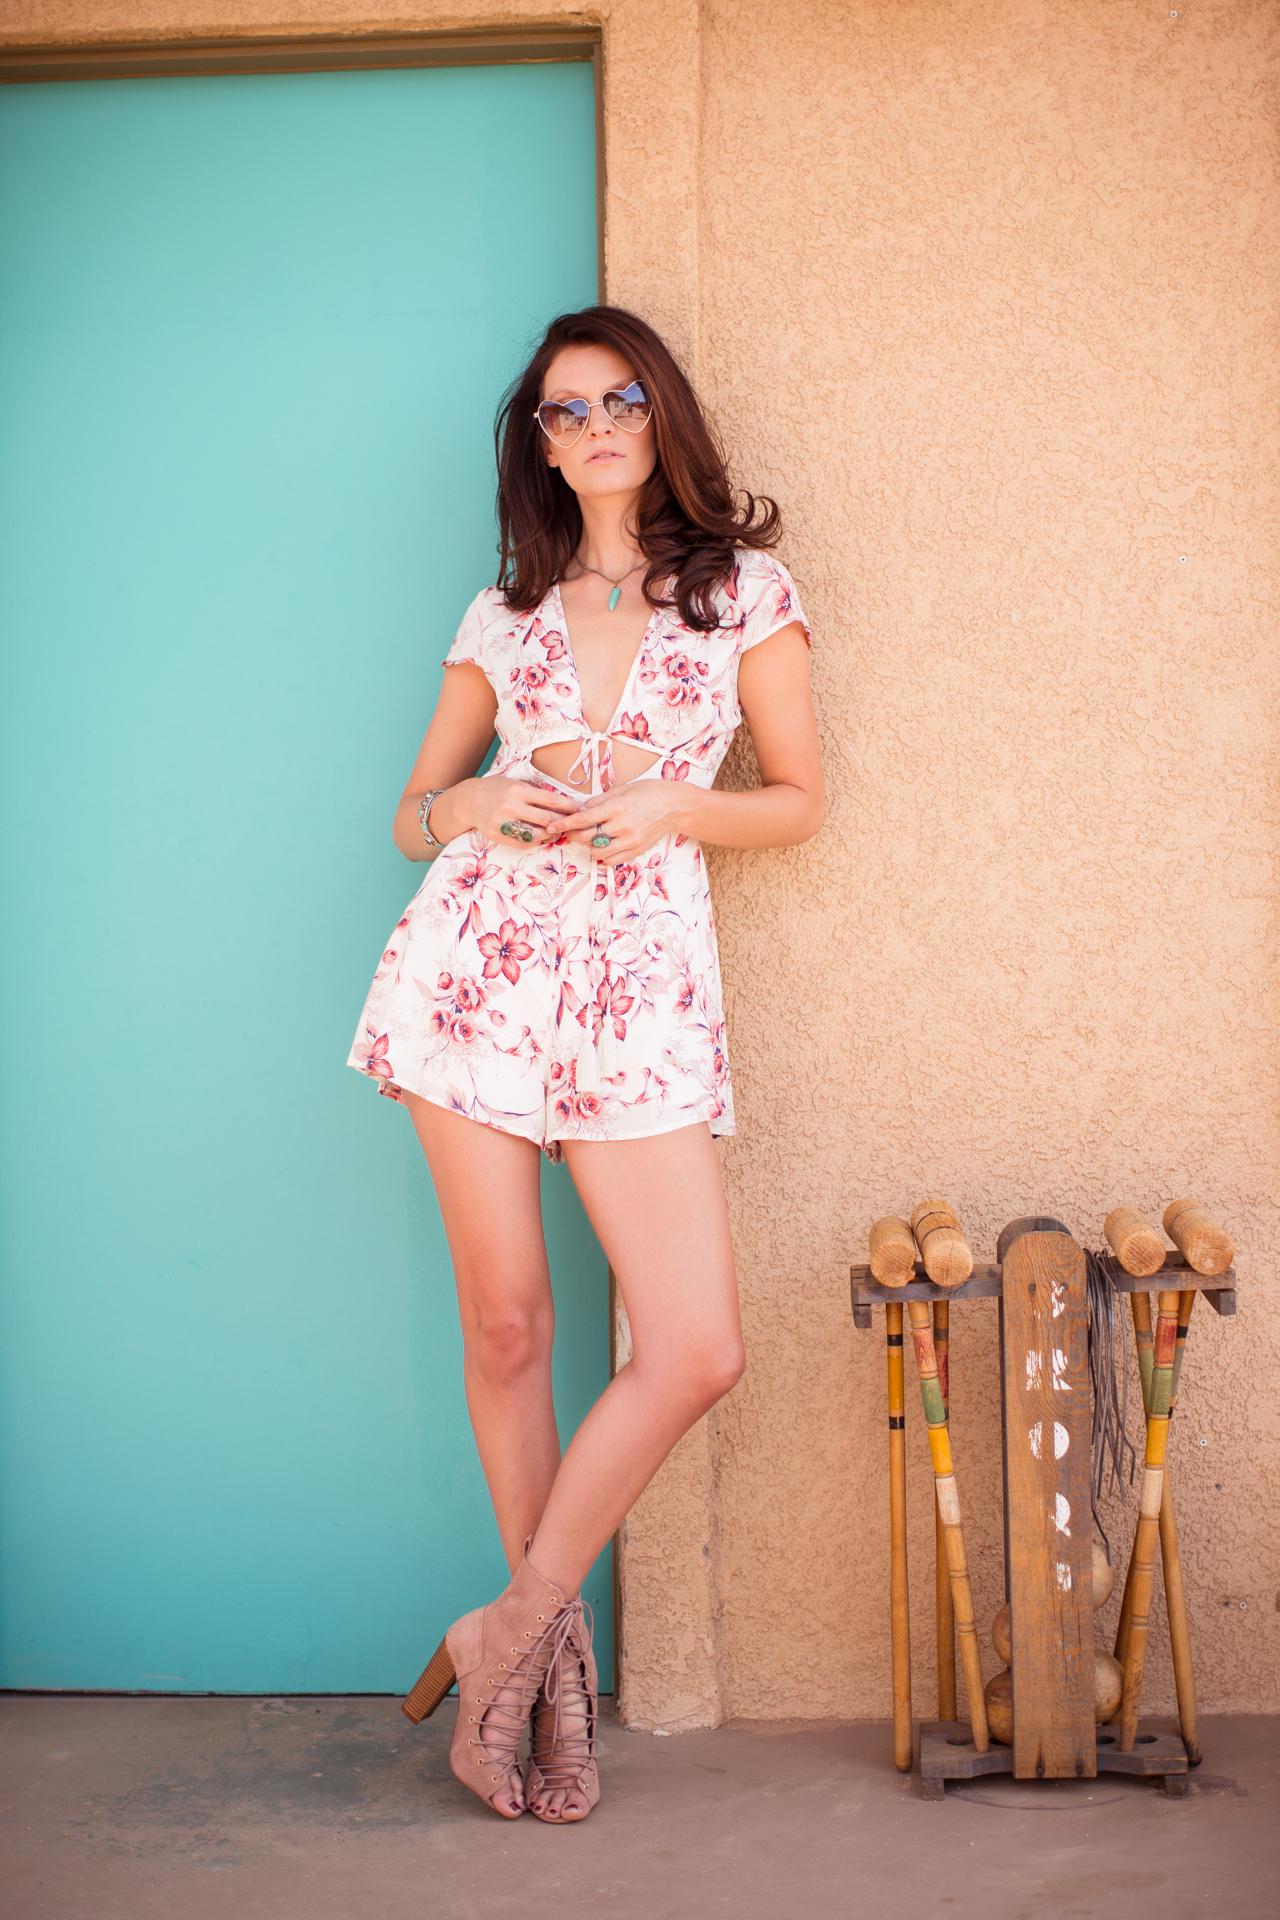 Fashion Product Photography - full body